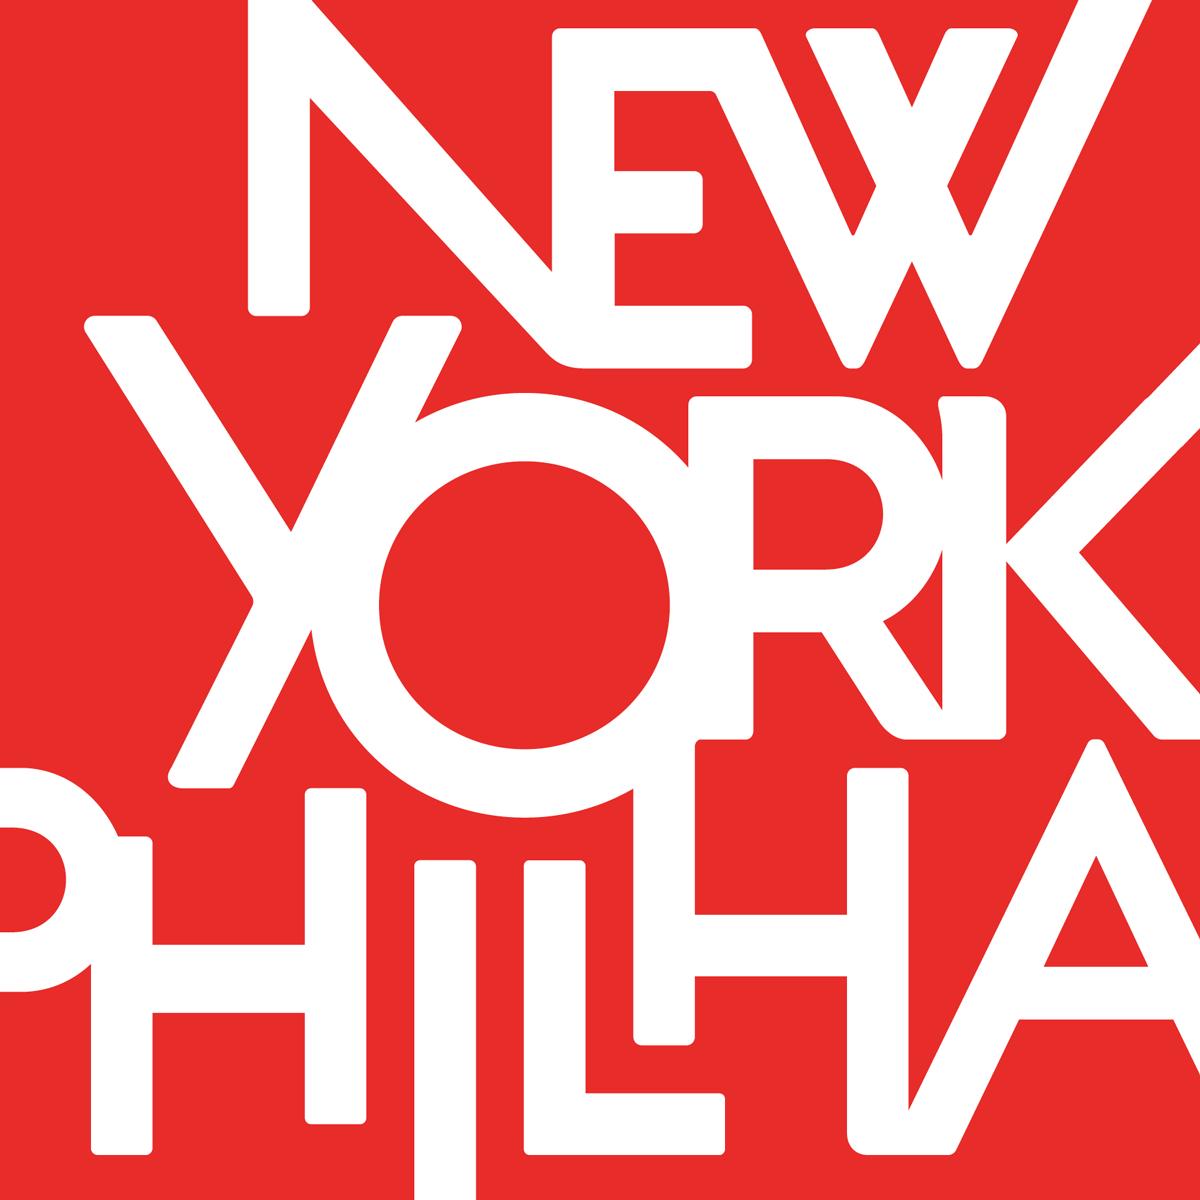 NYPhilharmonic_Redesign_logo_detail_2016